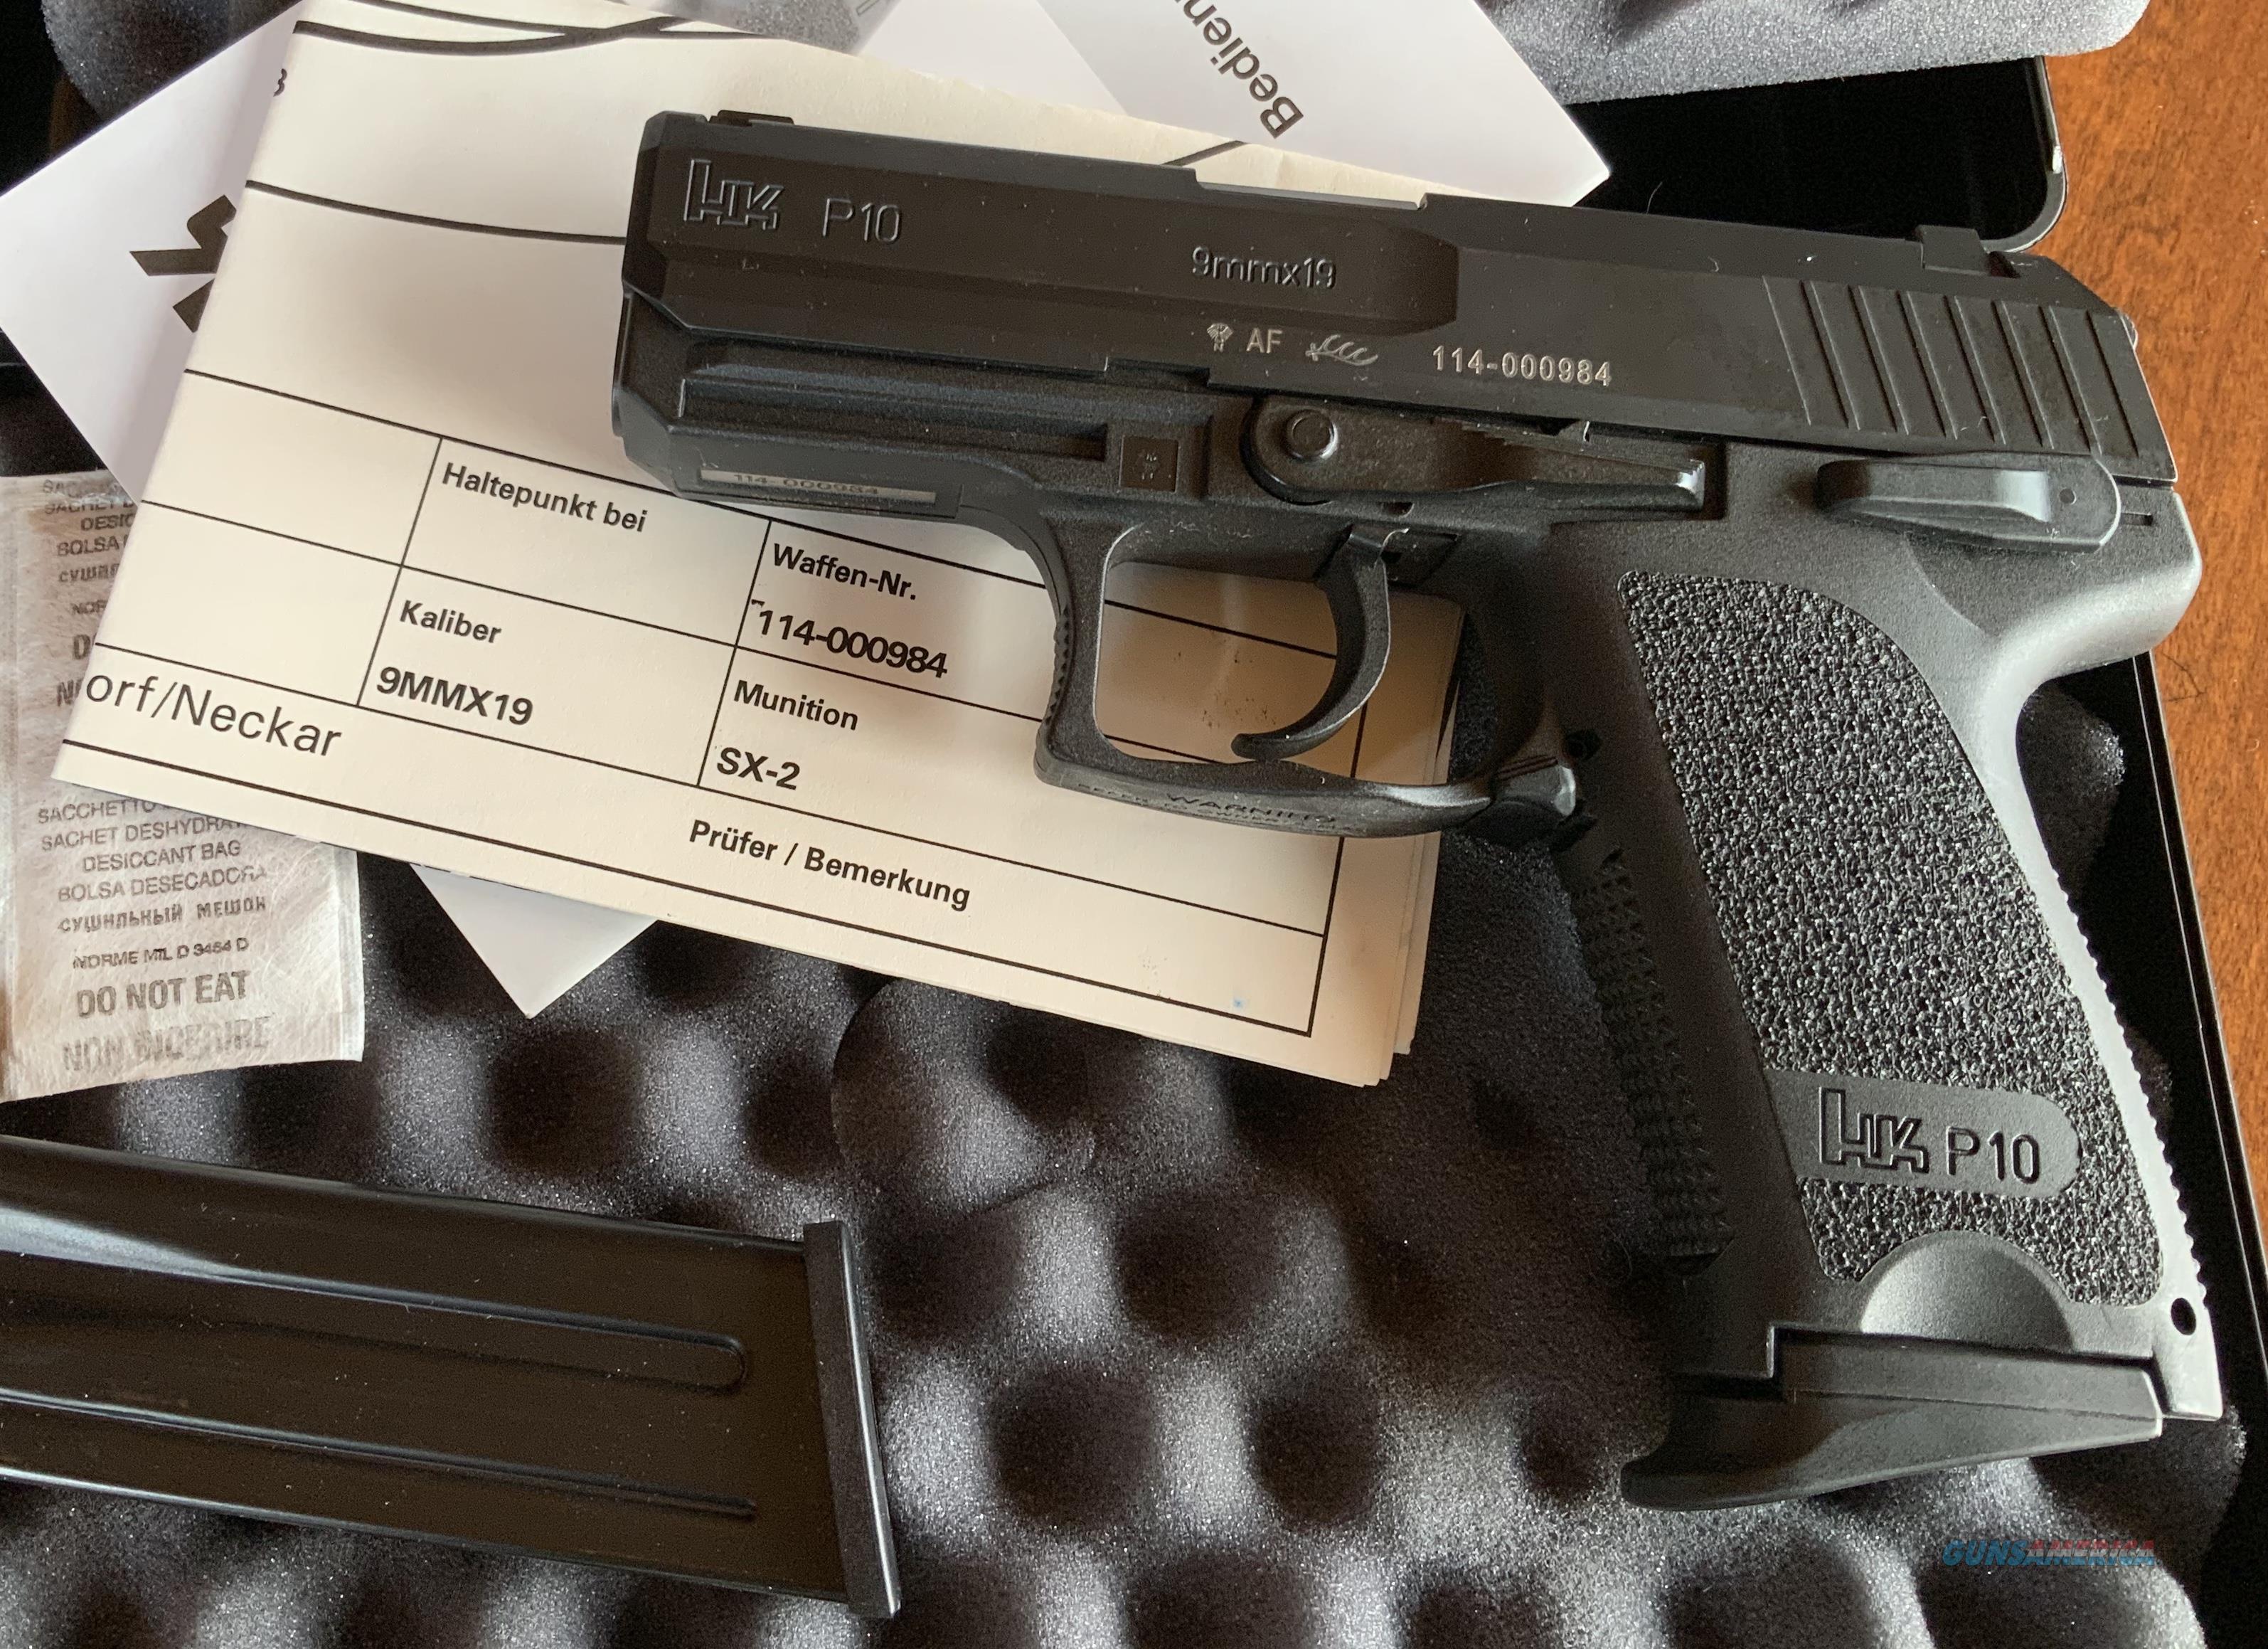 WTS HK P10   Guns > Pistols > Heckler & Koch Pistols > Polymer Frame